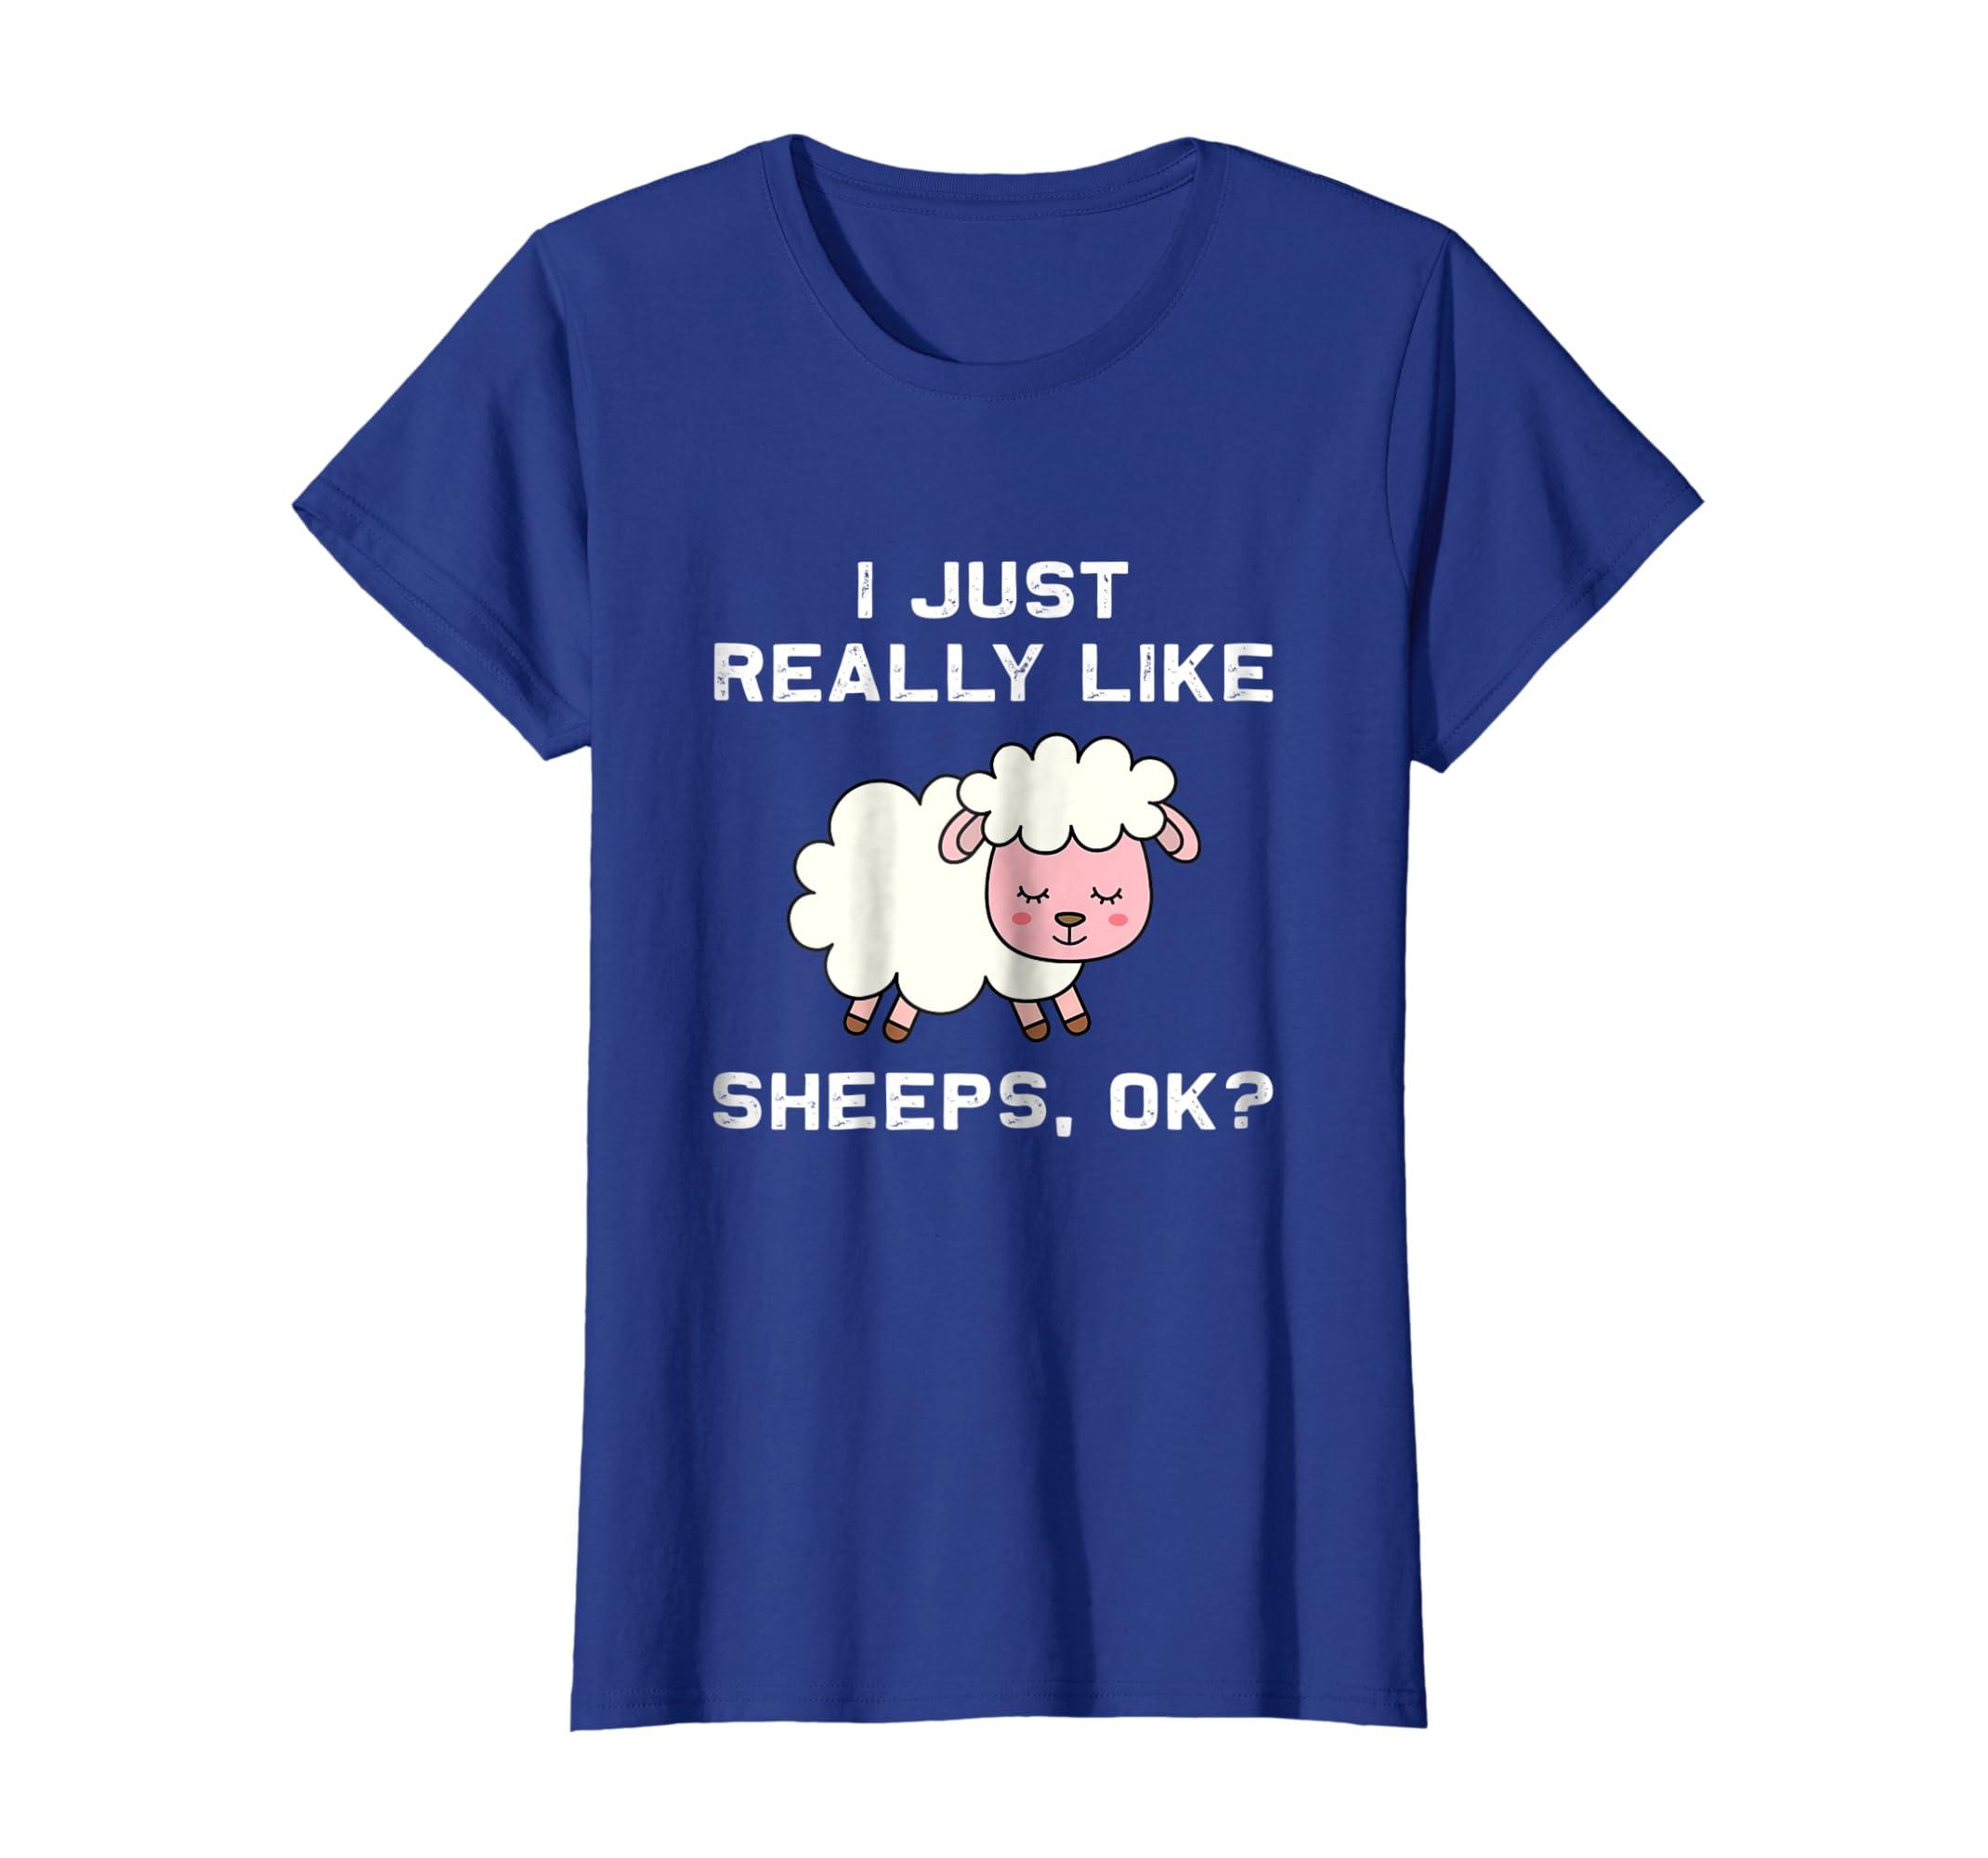 3a660cd1b Amazon.com: I Just Really Like Sheeps OK? - Funny Sheep T-shirt: Clothing